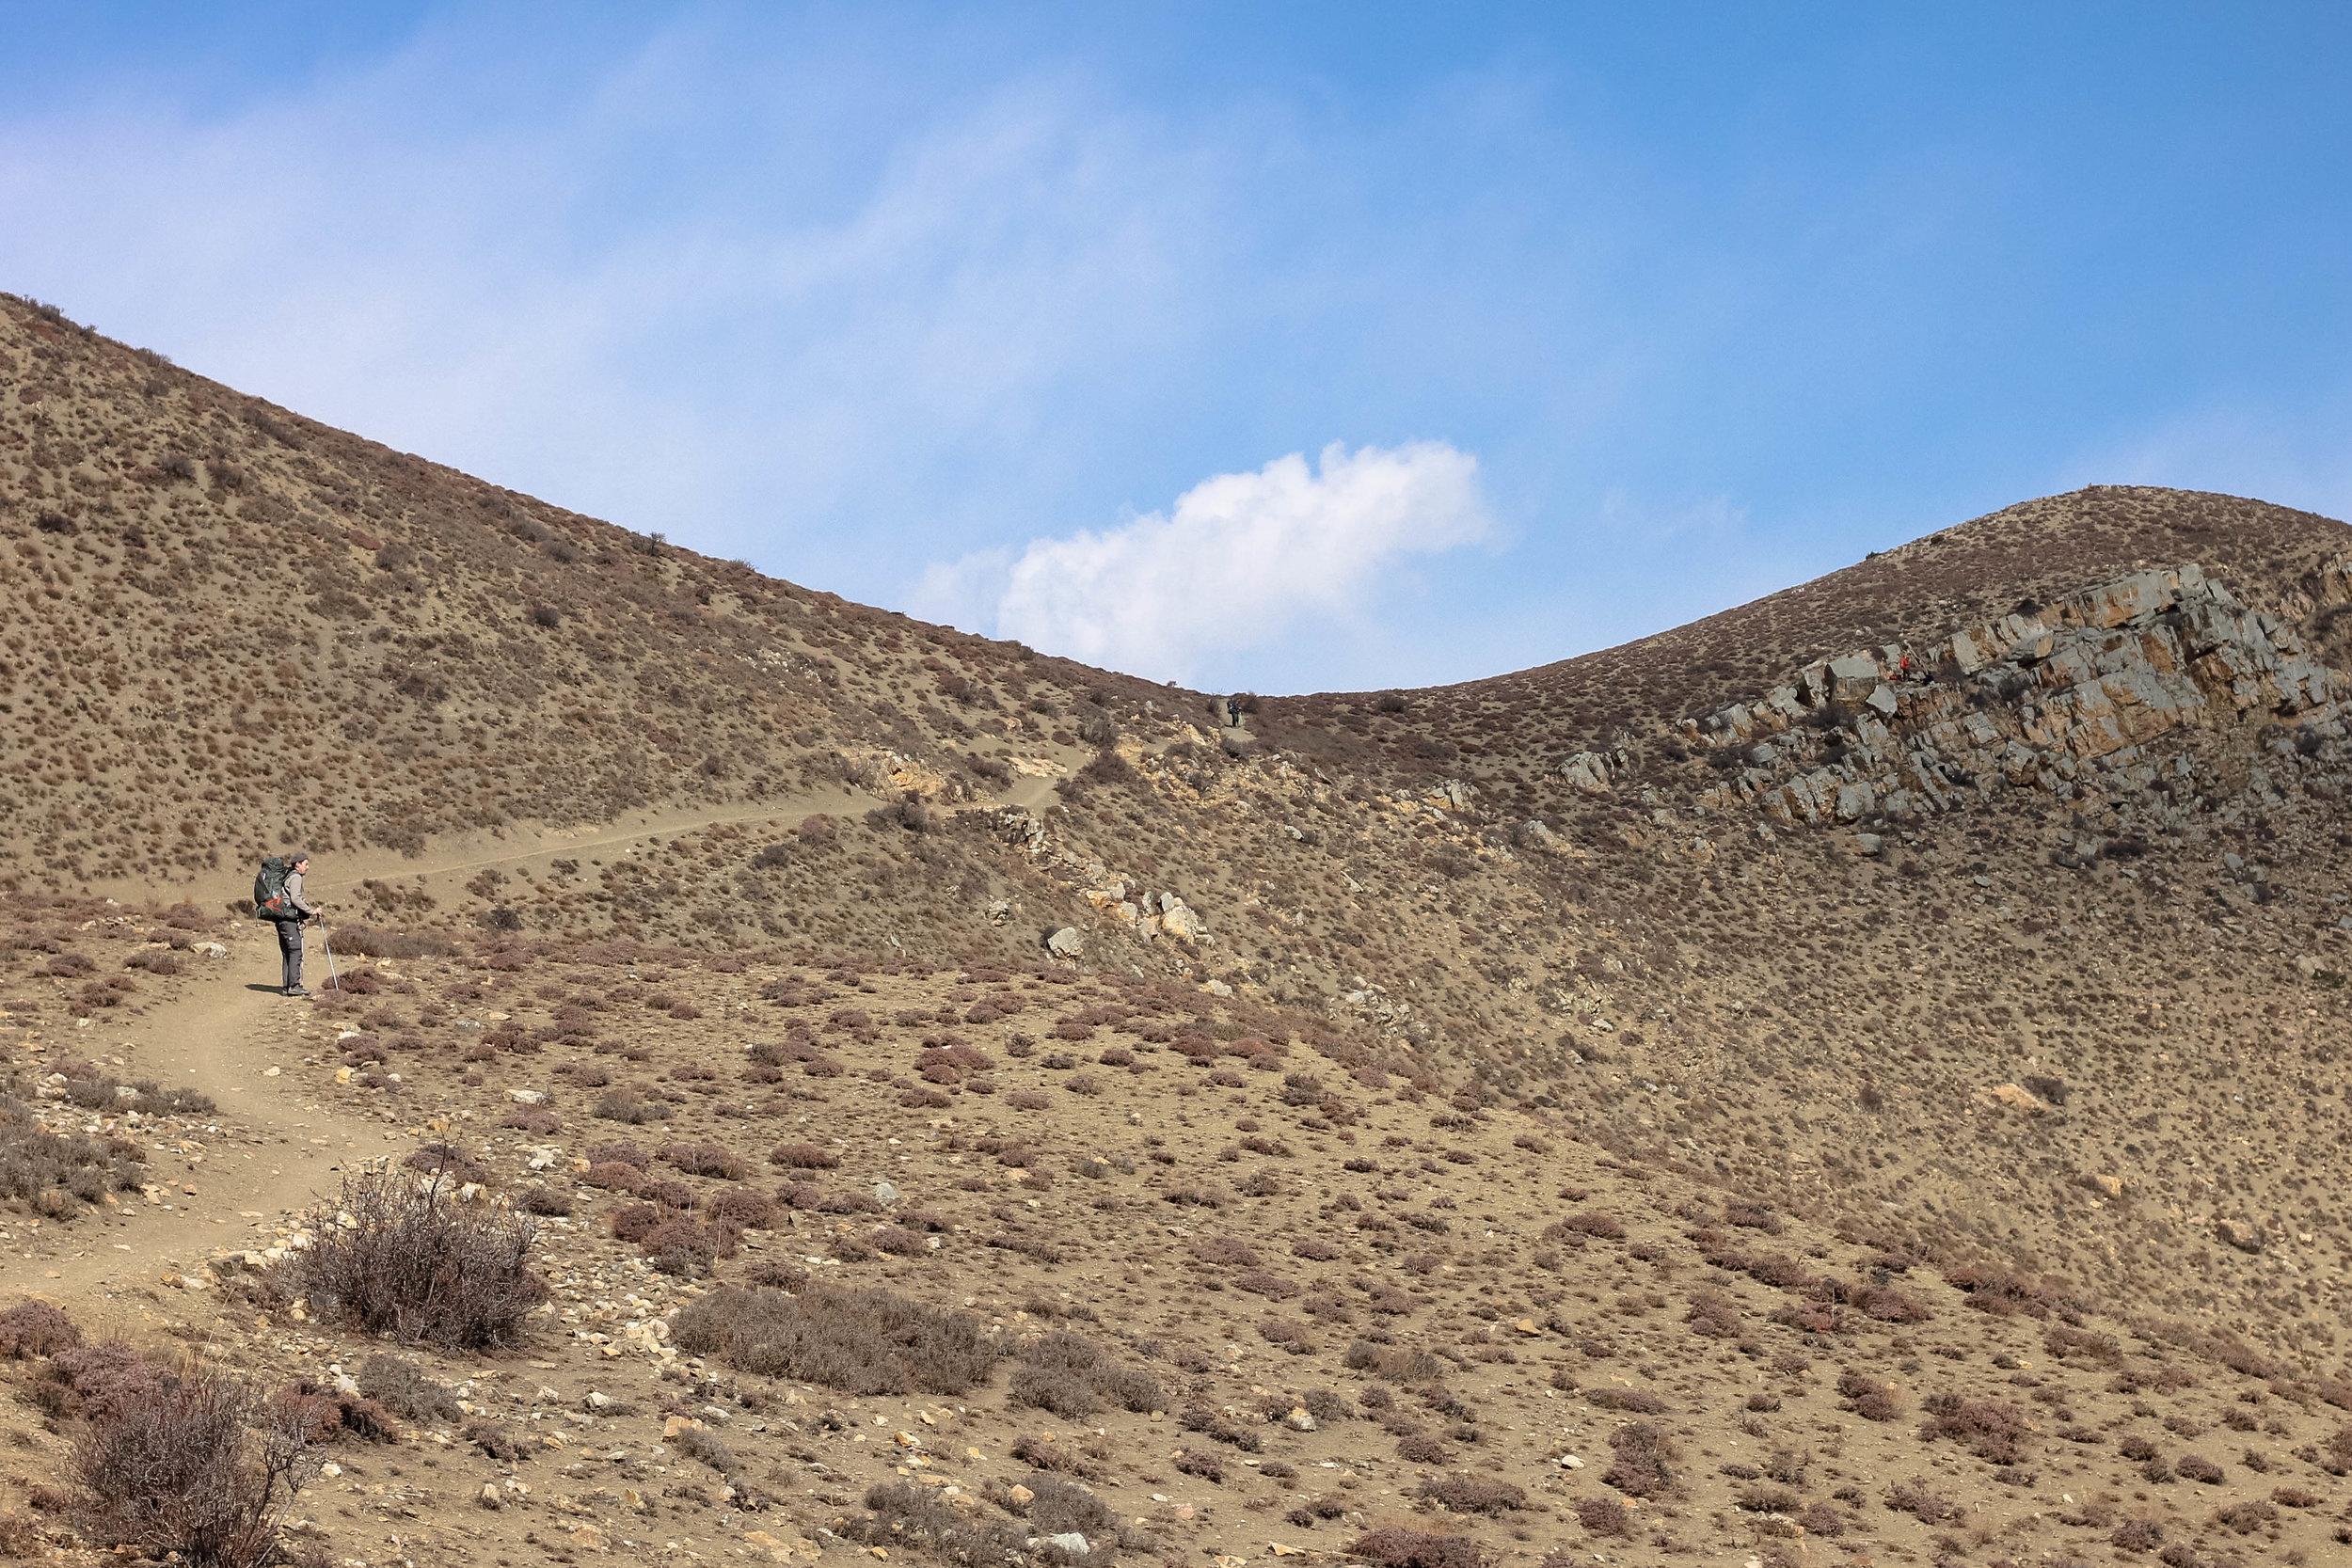 The sub-desert landscape in Muktinath.